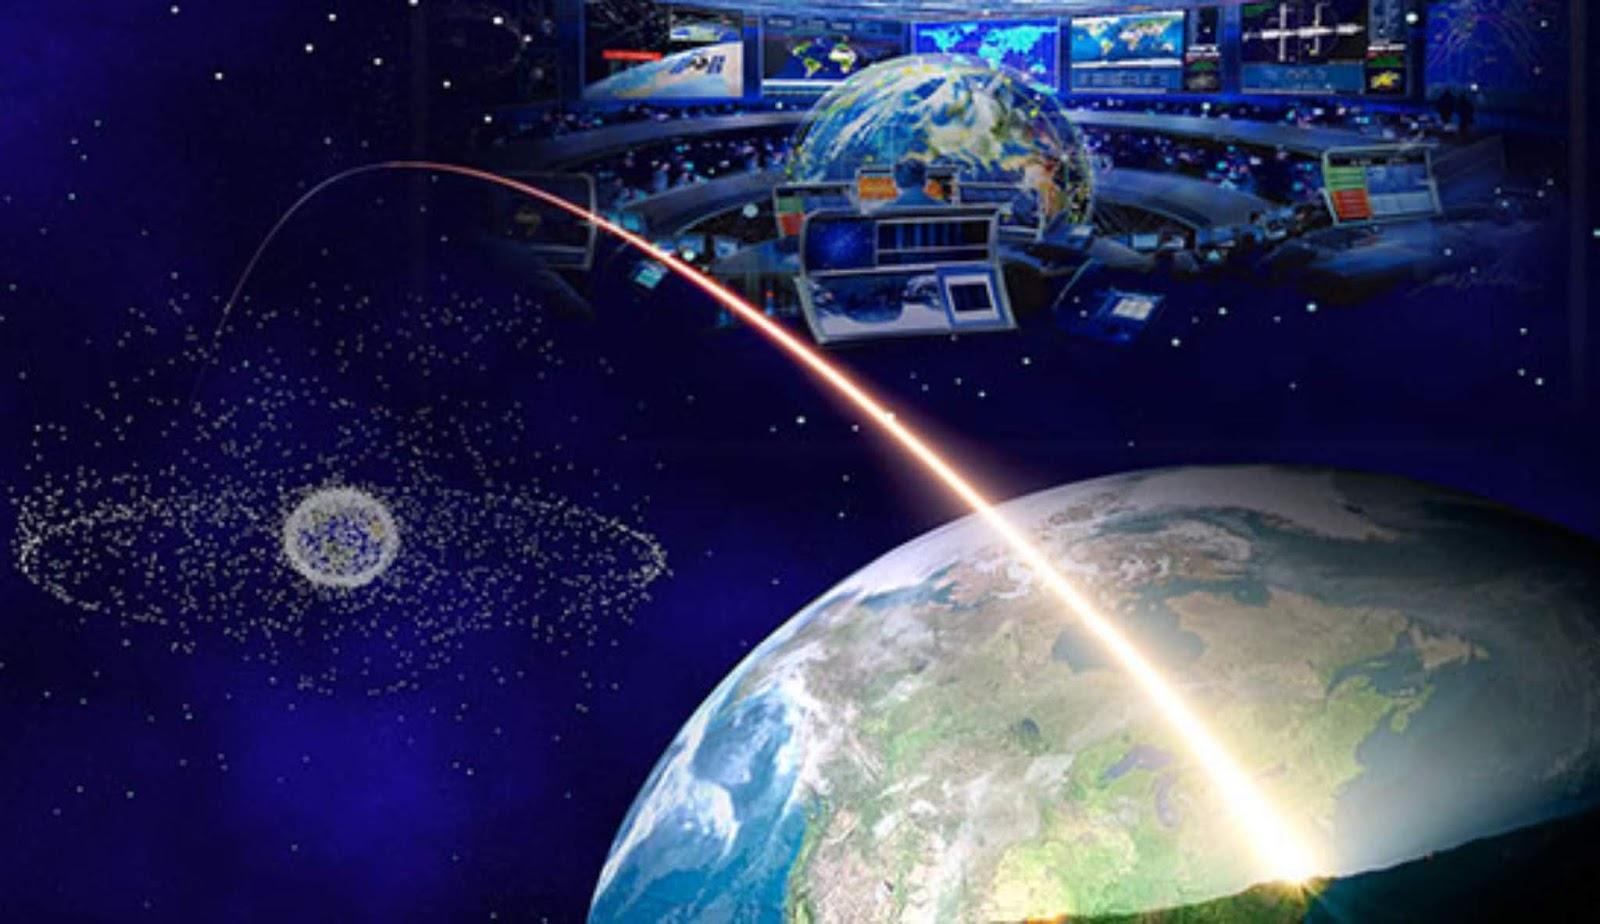 India akan mengadakan latihan militer pertama di luar angkasa